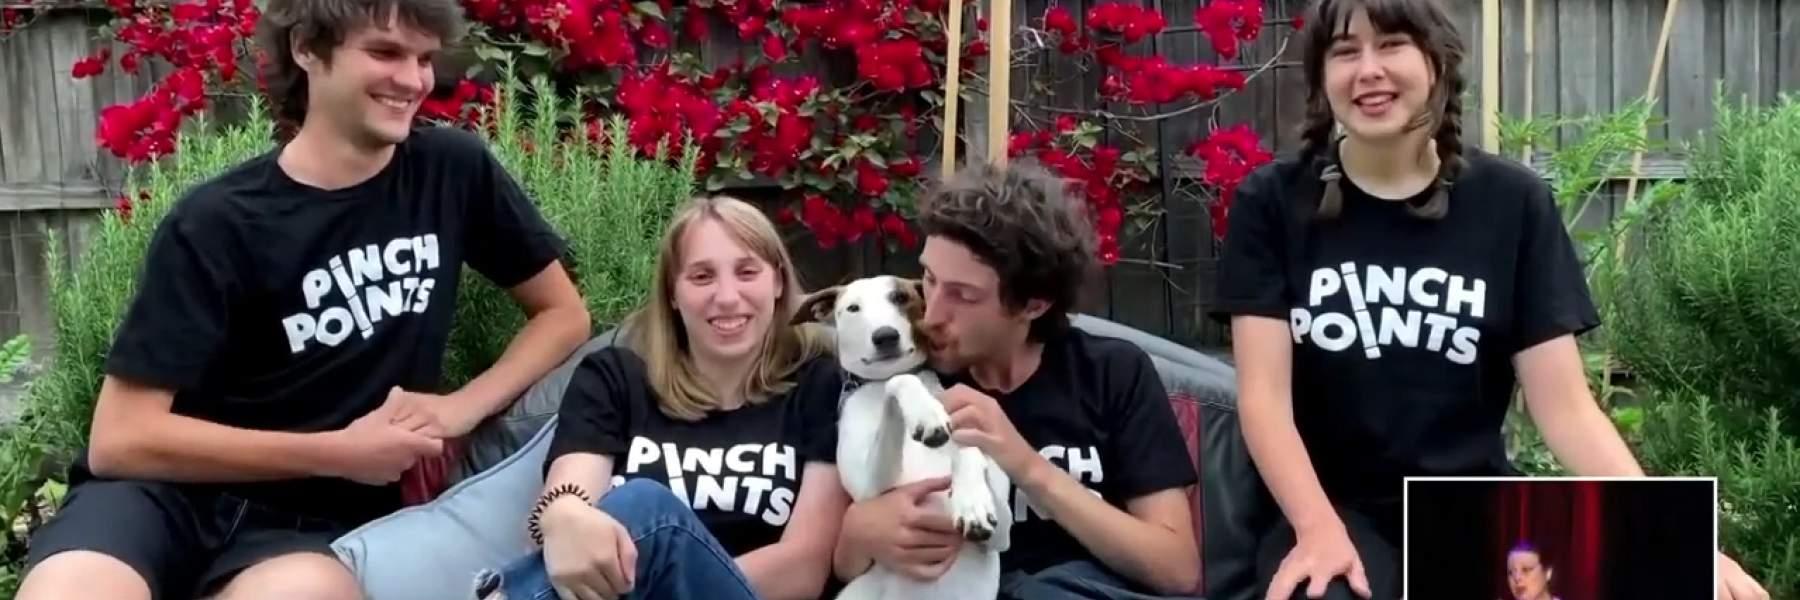 Pinch Points - Music Victoria Awards 2020